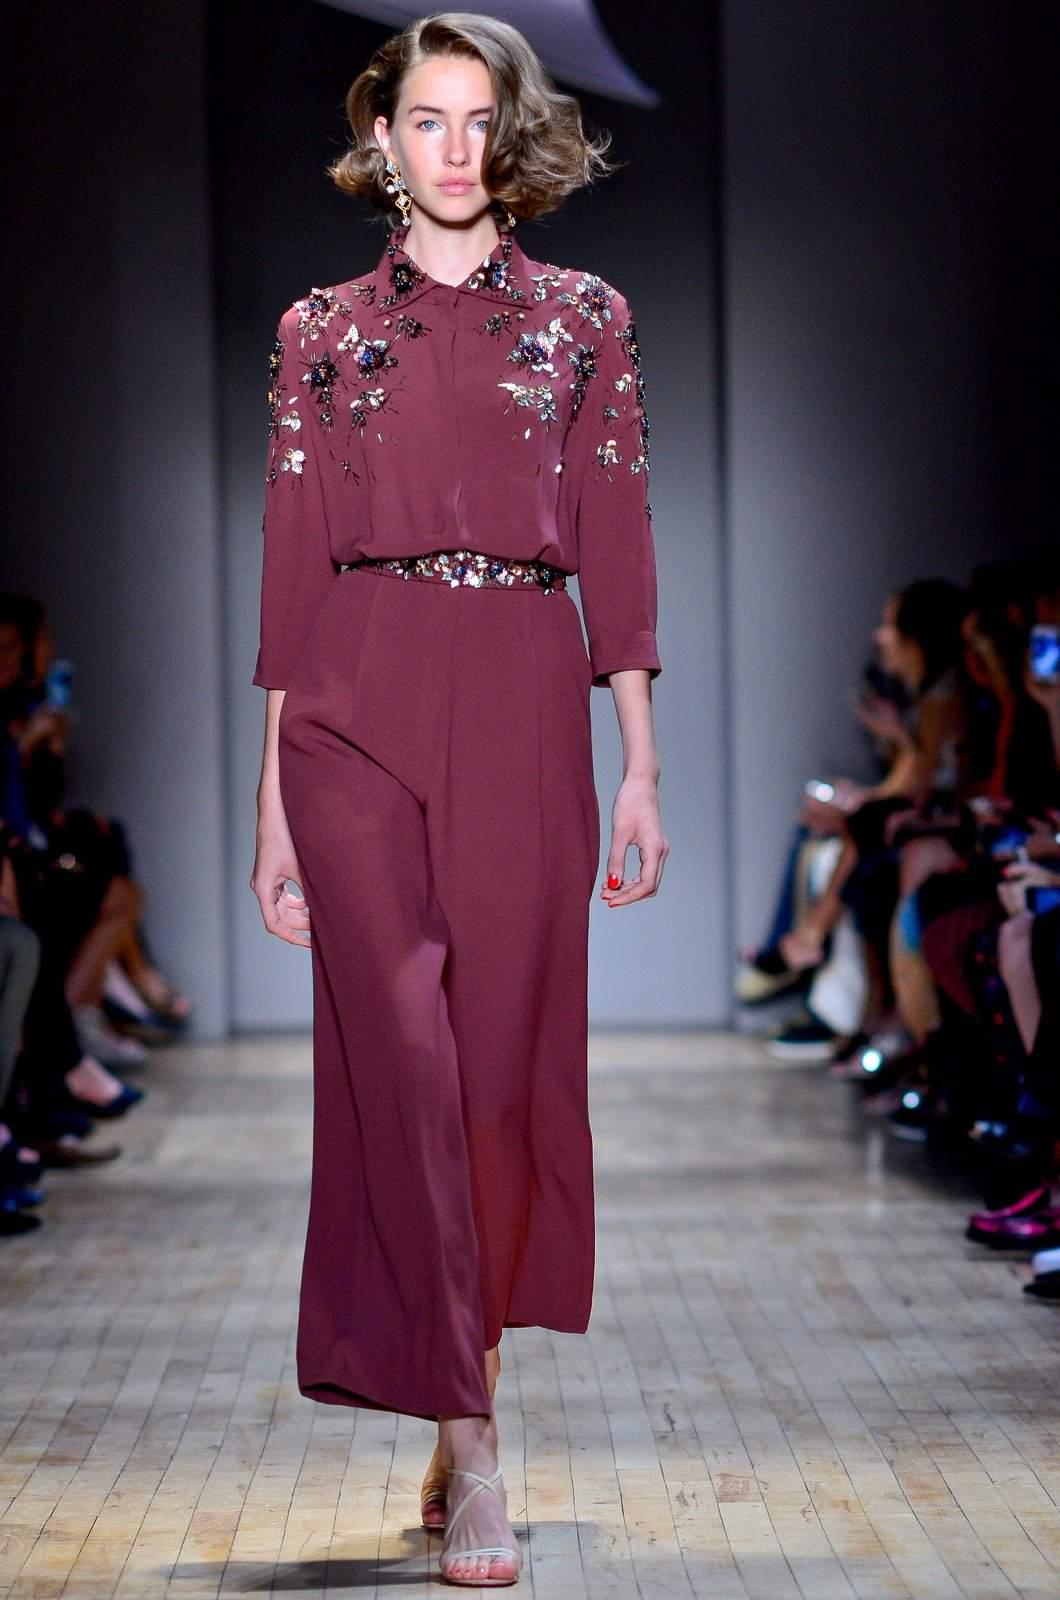 jenny packham6 Jenny Packham Spring/Summer Collection 2015 at NYC Fashion Week